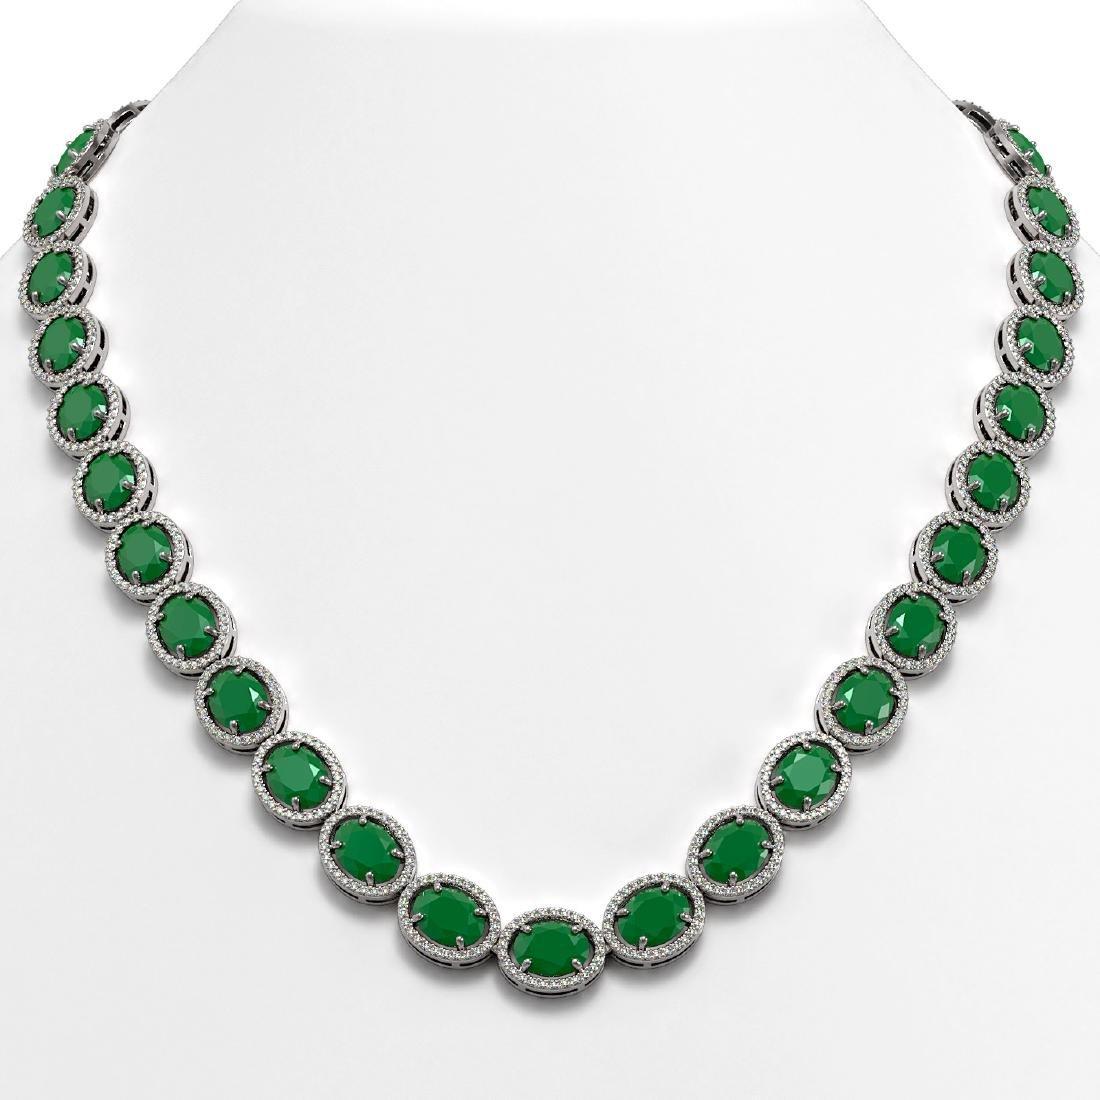 71.87 CTW Emerald & Diamond Halo Necklace 10K White